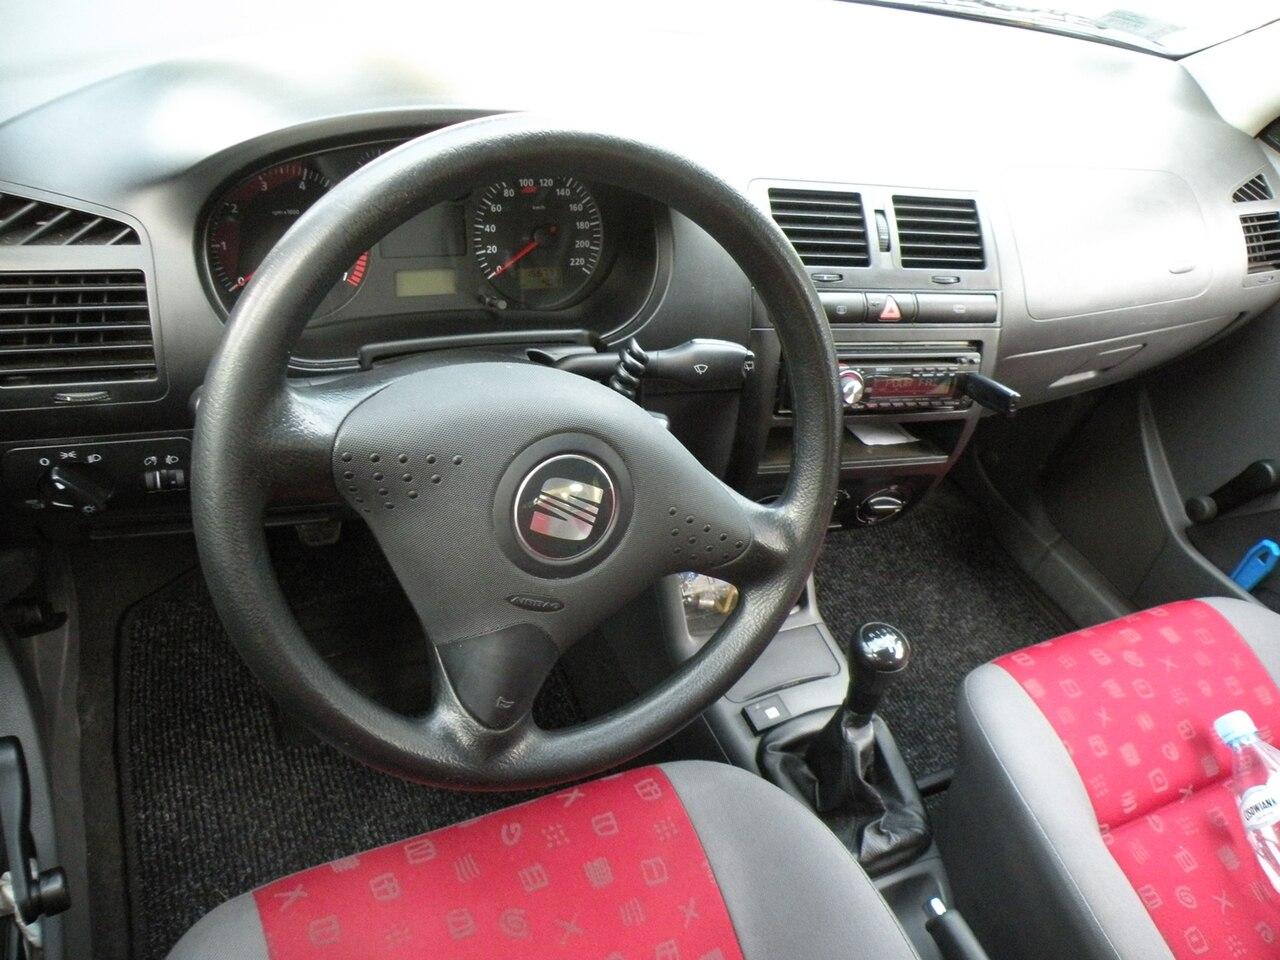 Datei:SEAT Ibiza Mk2 fl interior.JPG – Wikipedia